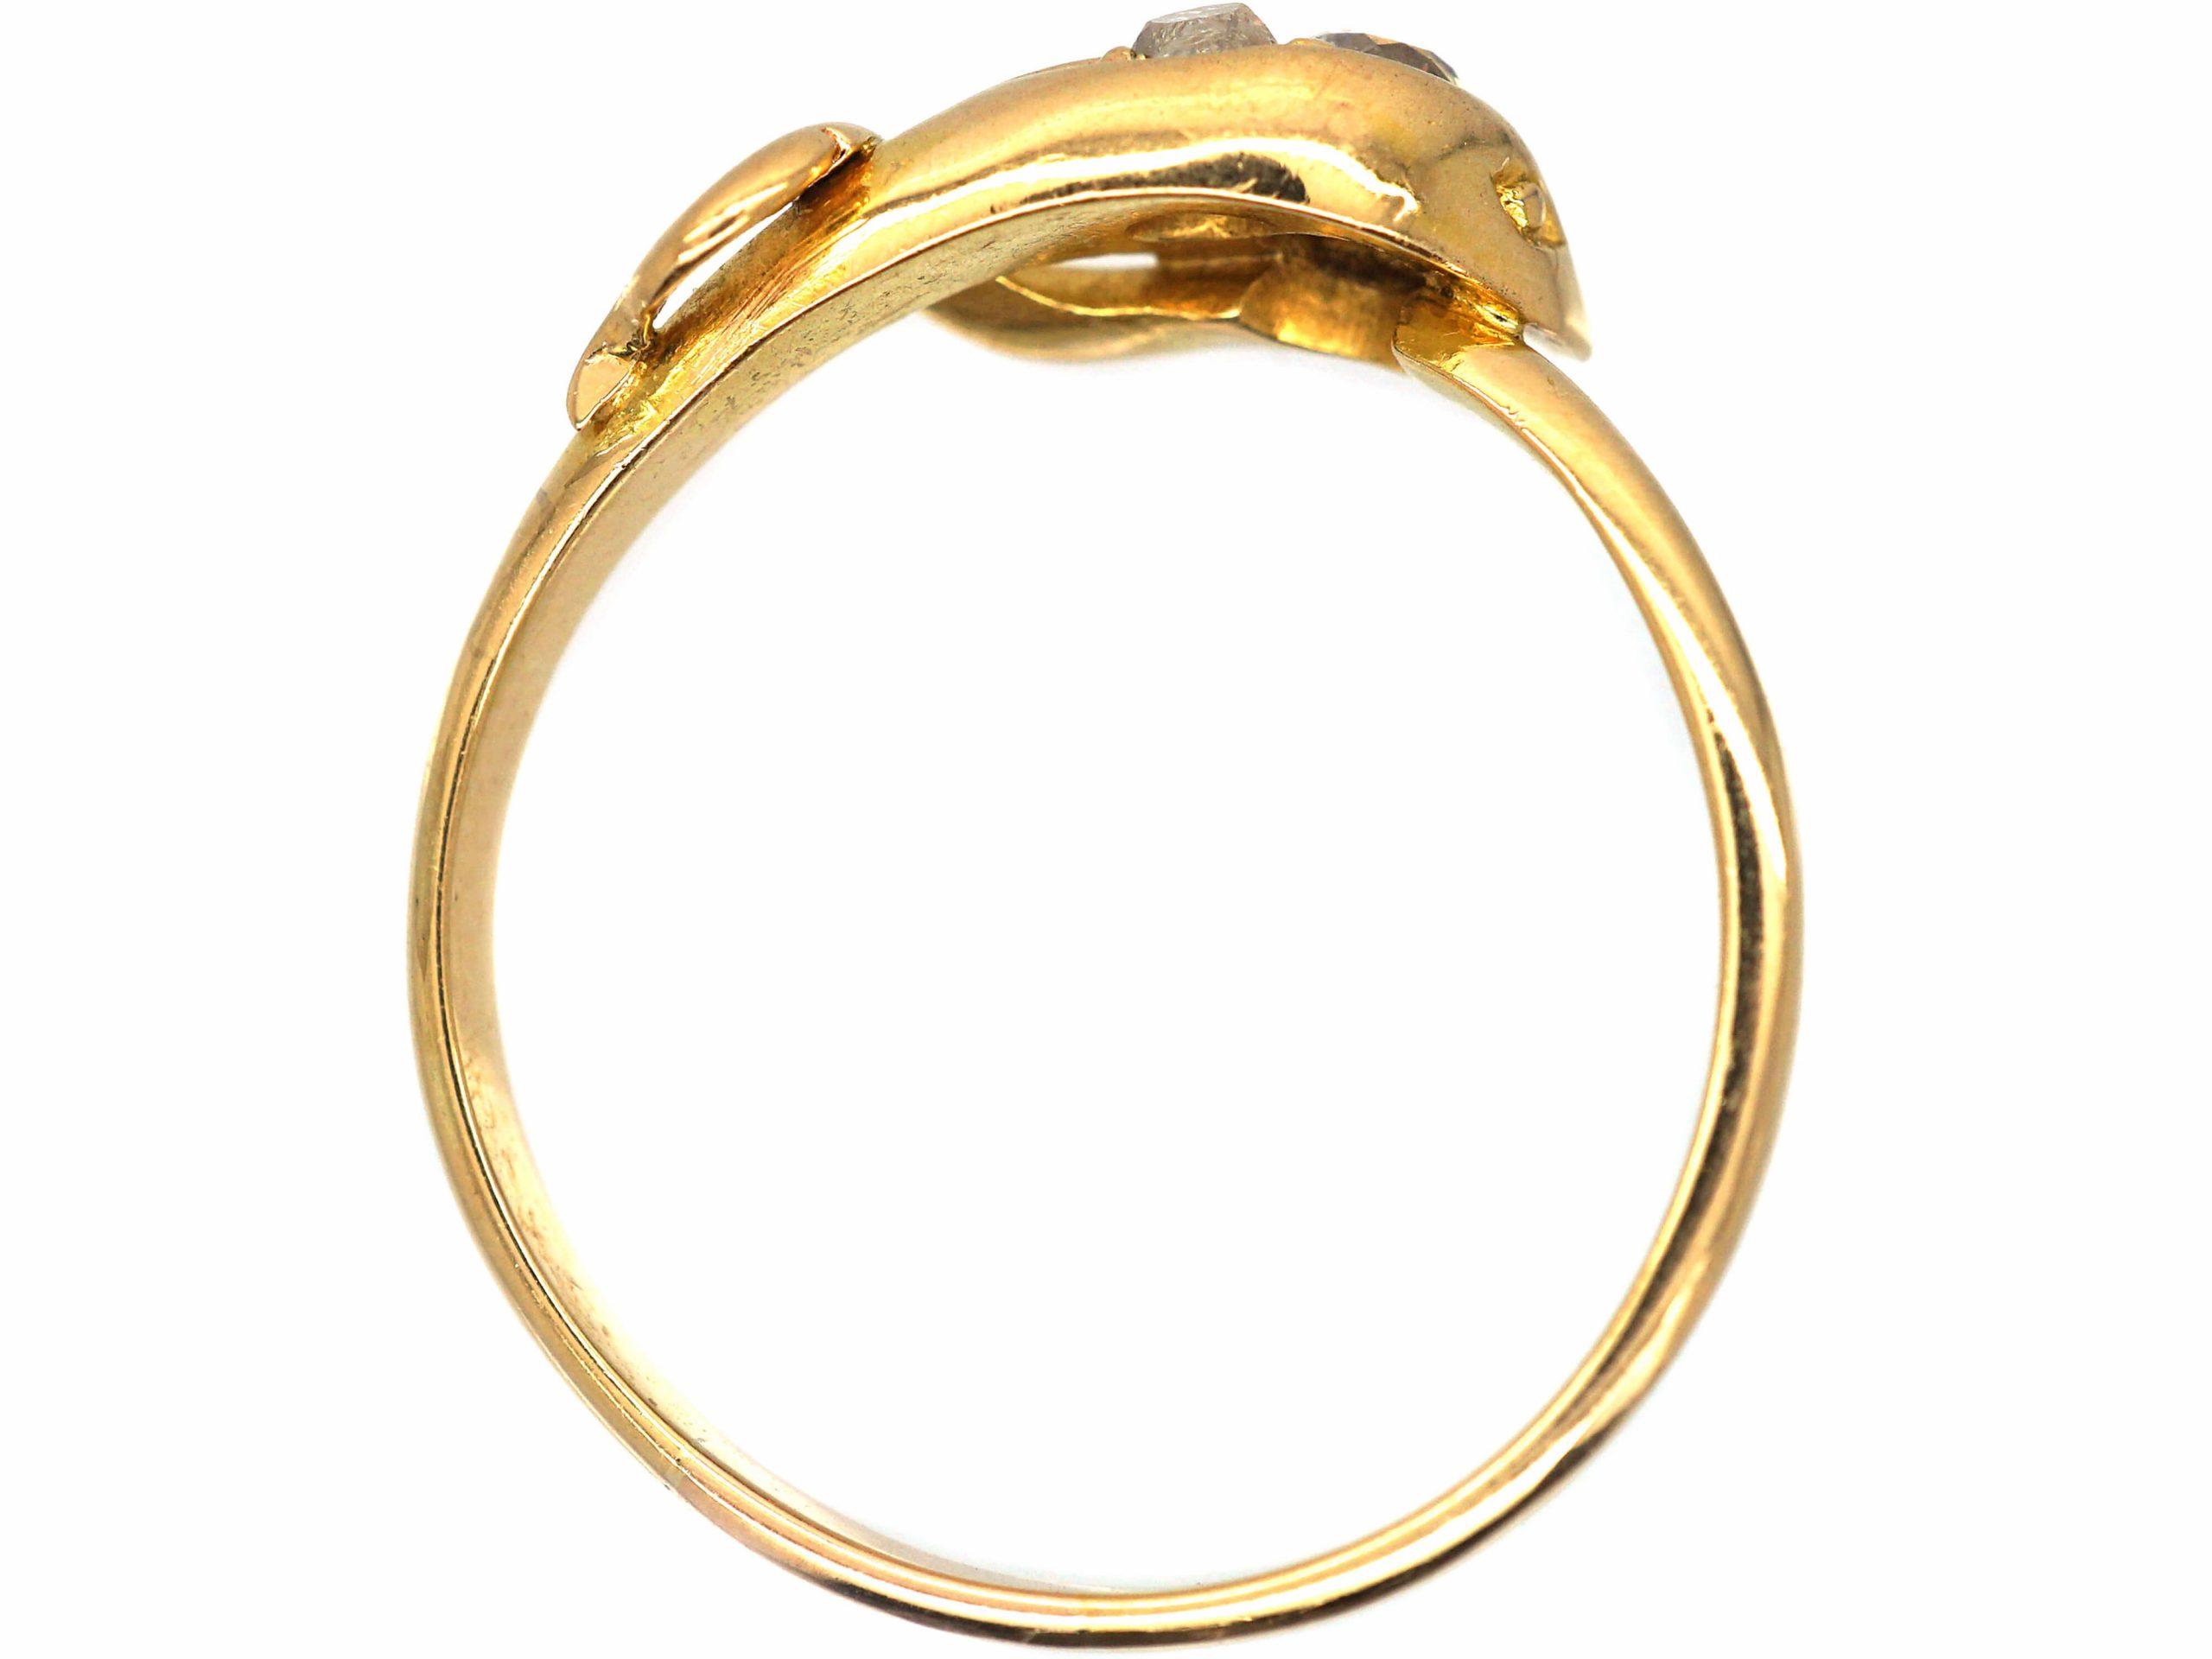 Edwardian 18ct Gold Snake Ring set with Diamonds